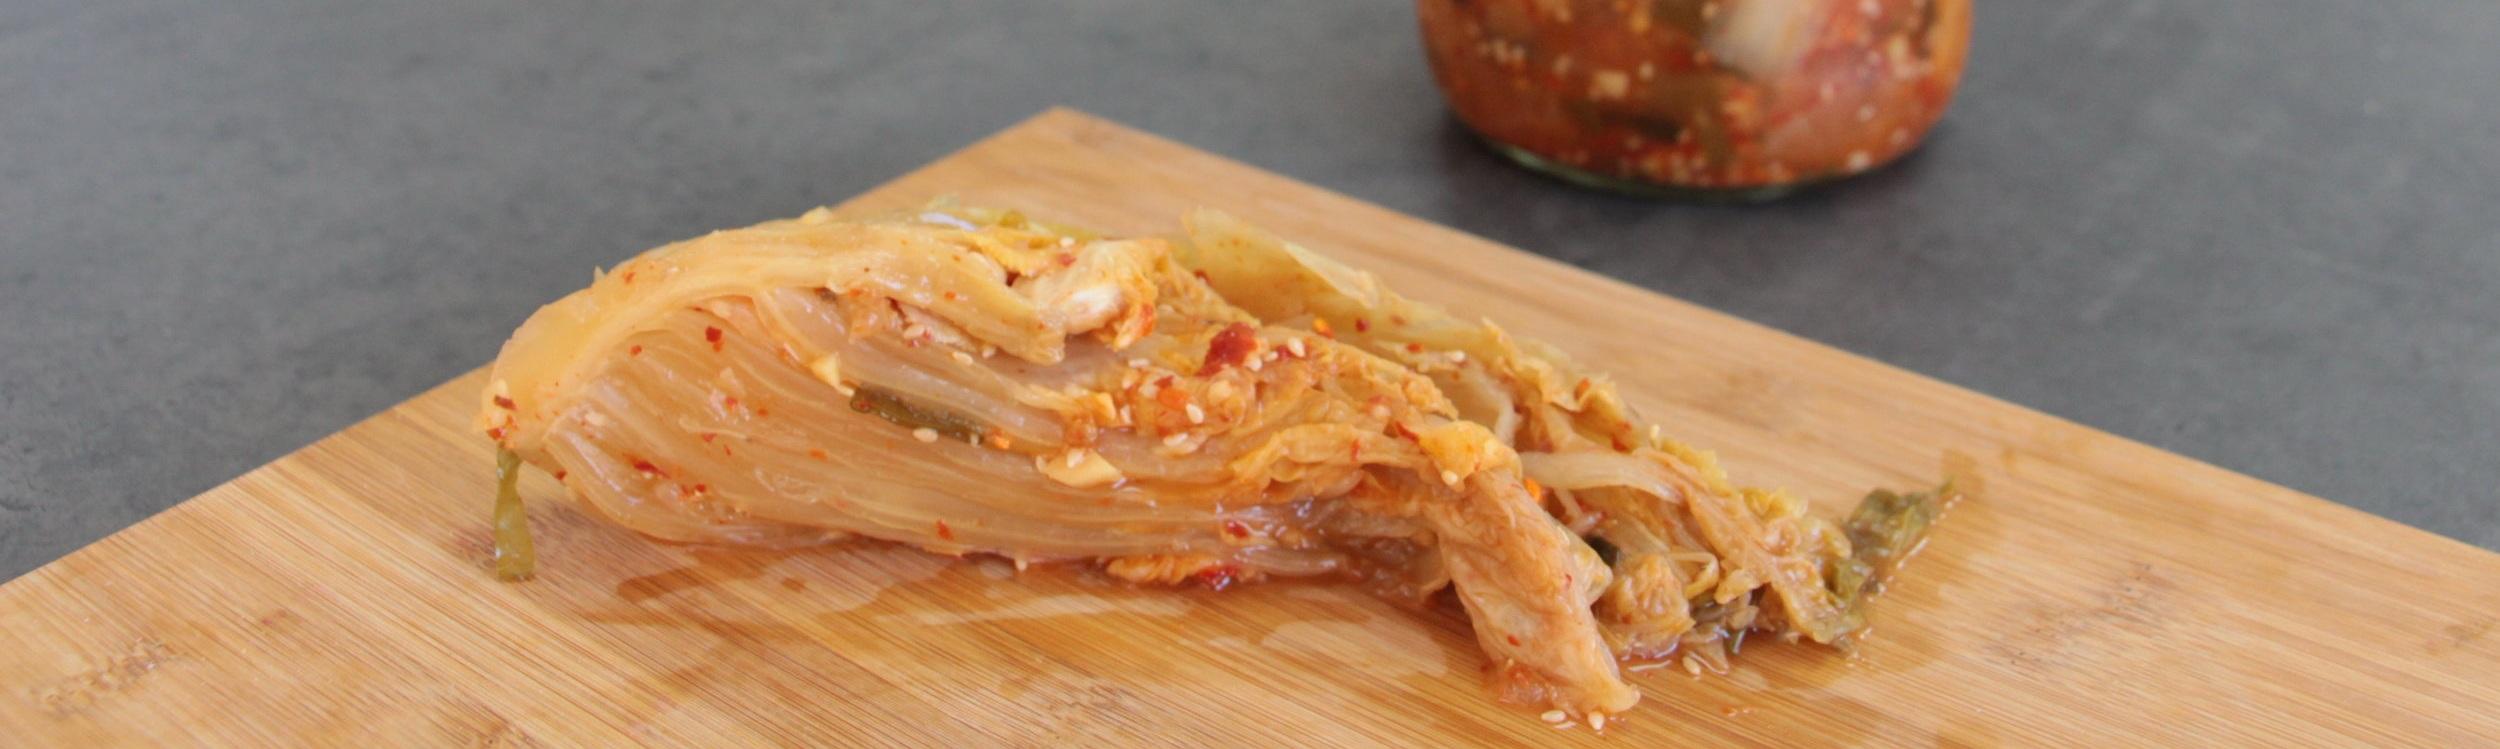 kimchi kamidedeus